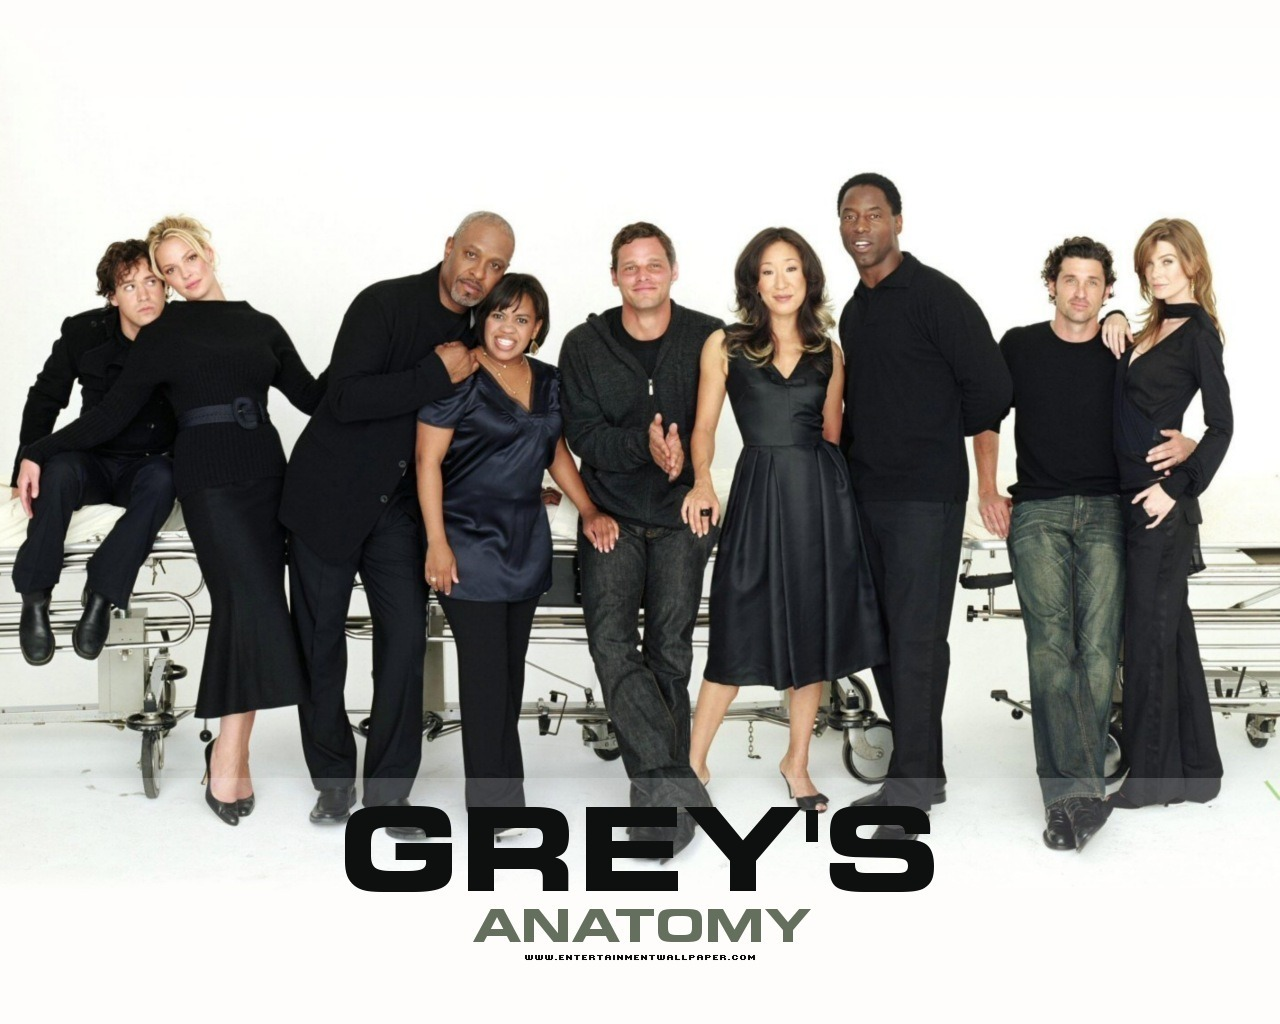 Greys Anatomy Season 7 Episode 10 Adrift And At Peace Tvseriesonline